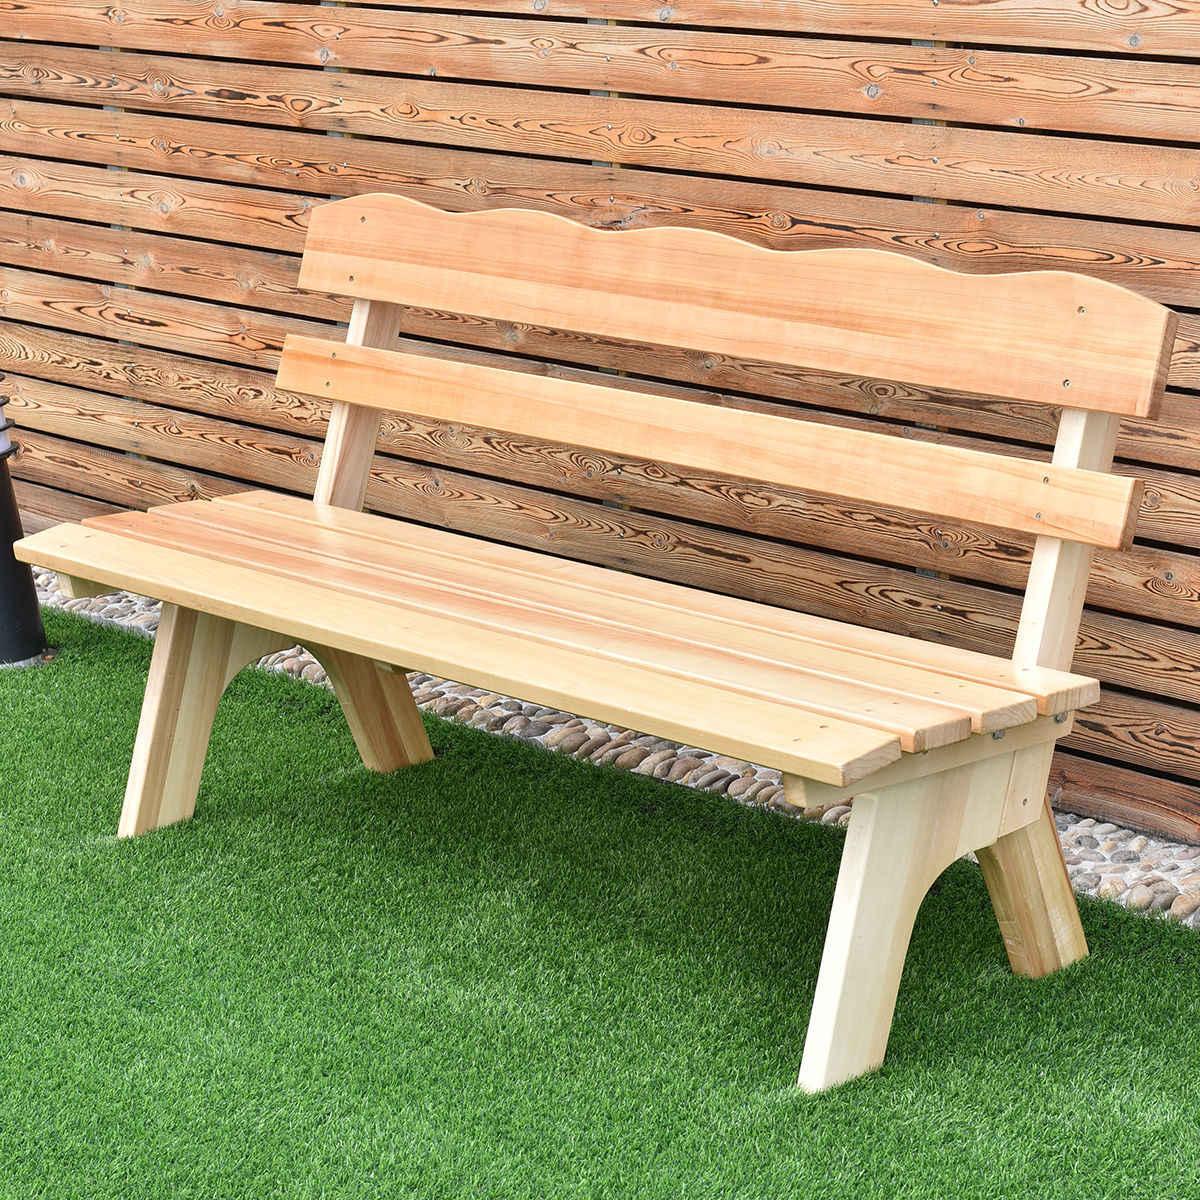 Wood Garden Benches Throughout Recent Giantex 5 Ft 3 Seats Outdoor Wooden Garden Bench Chair (View 28 of 30)